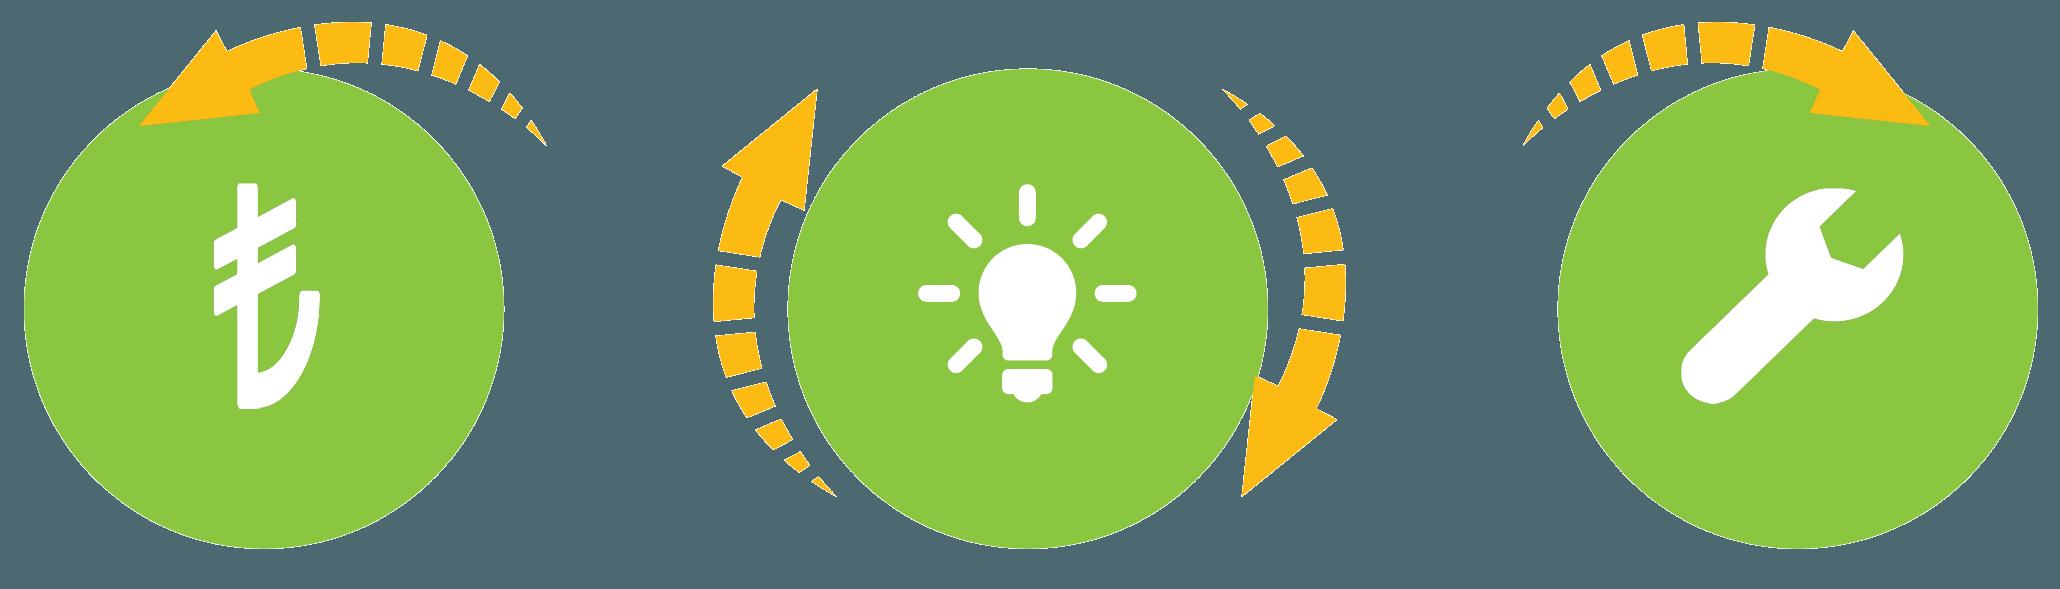 enerji tasarrufu kazanç